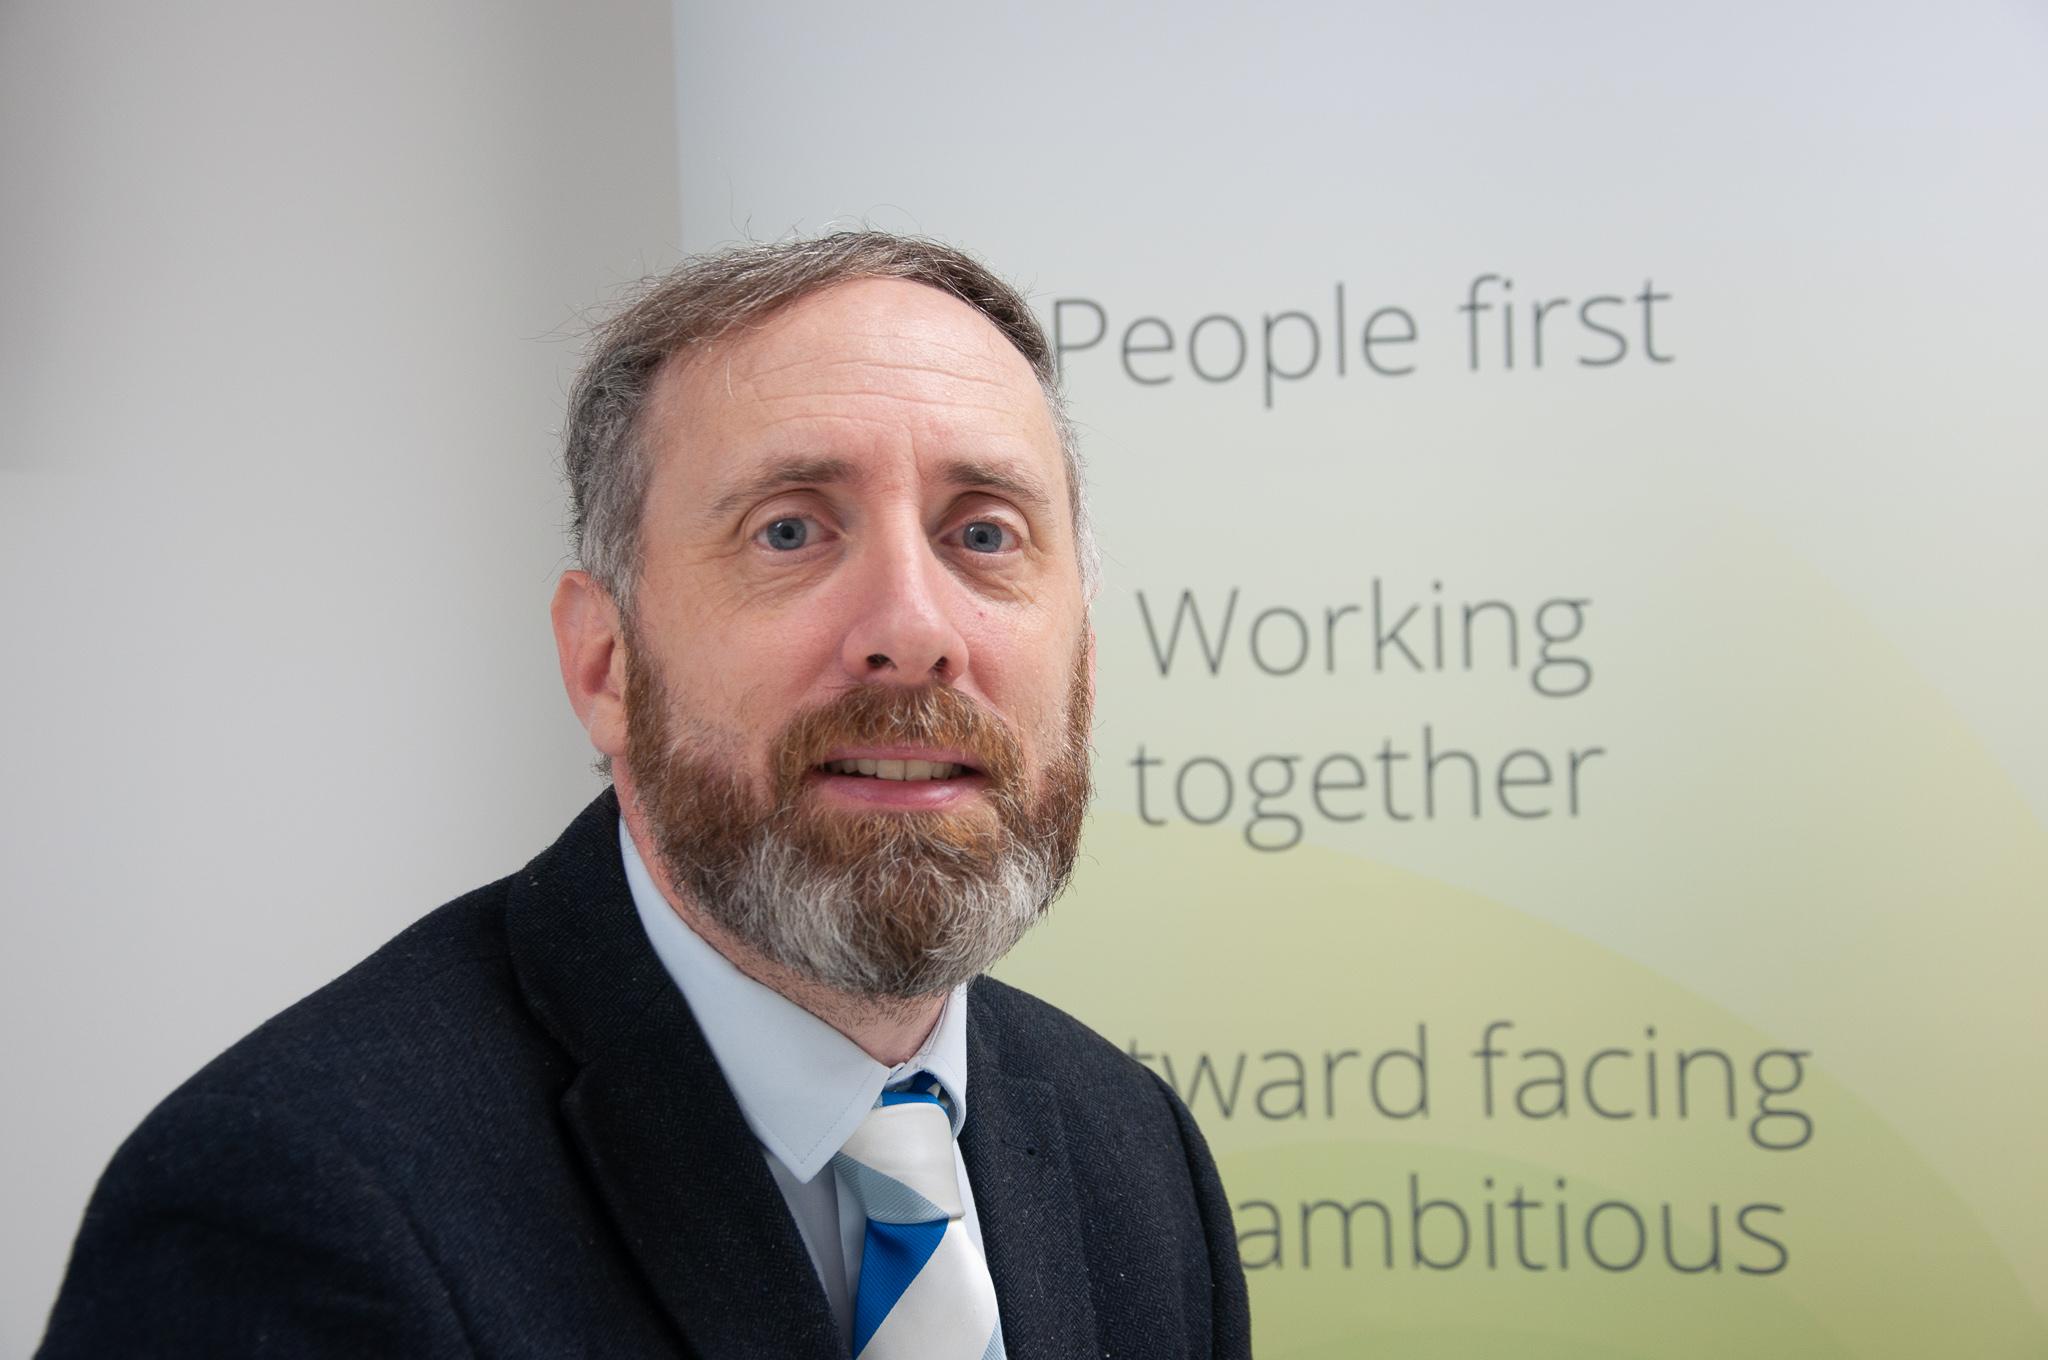 Chris Hill, CEO of Nene Education Trust